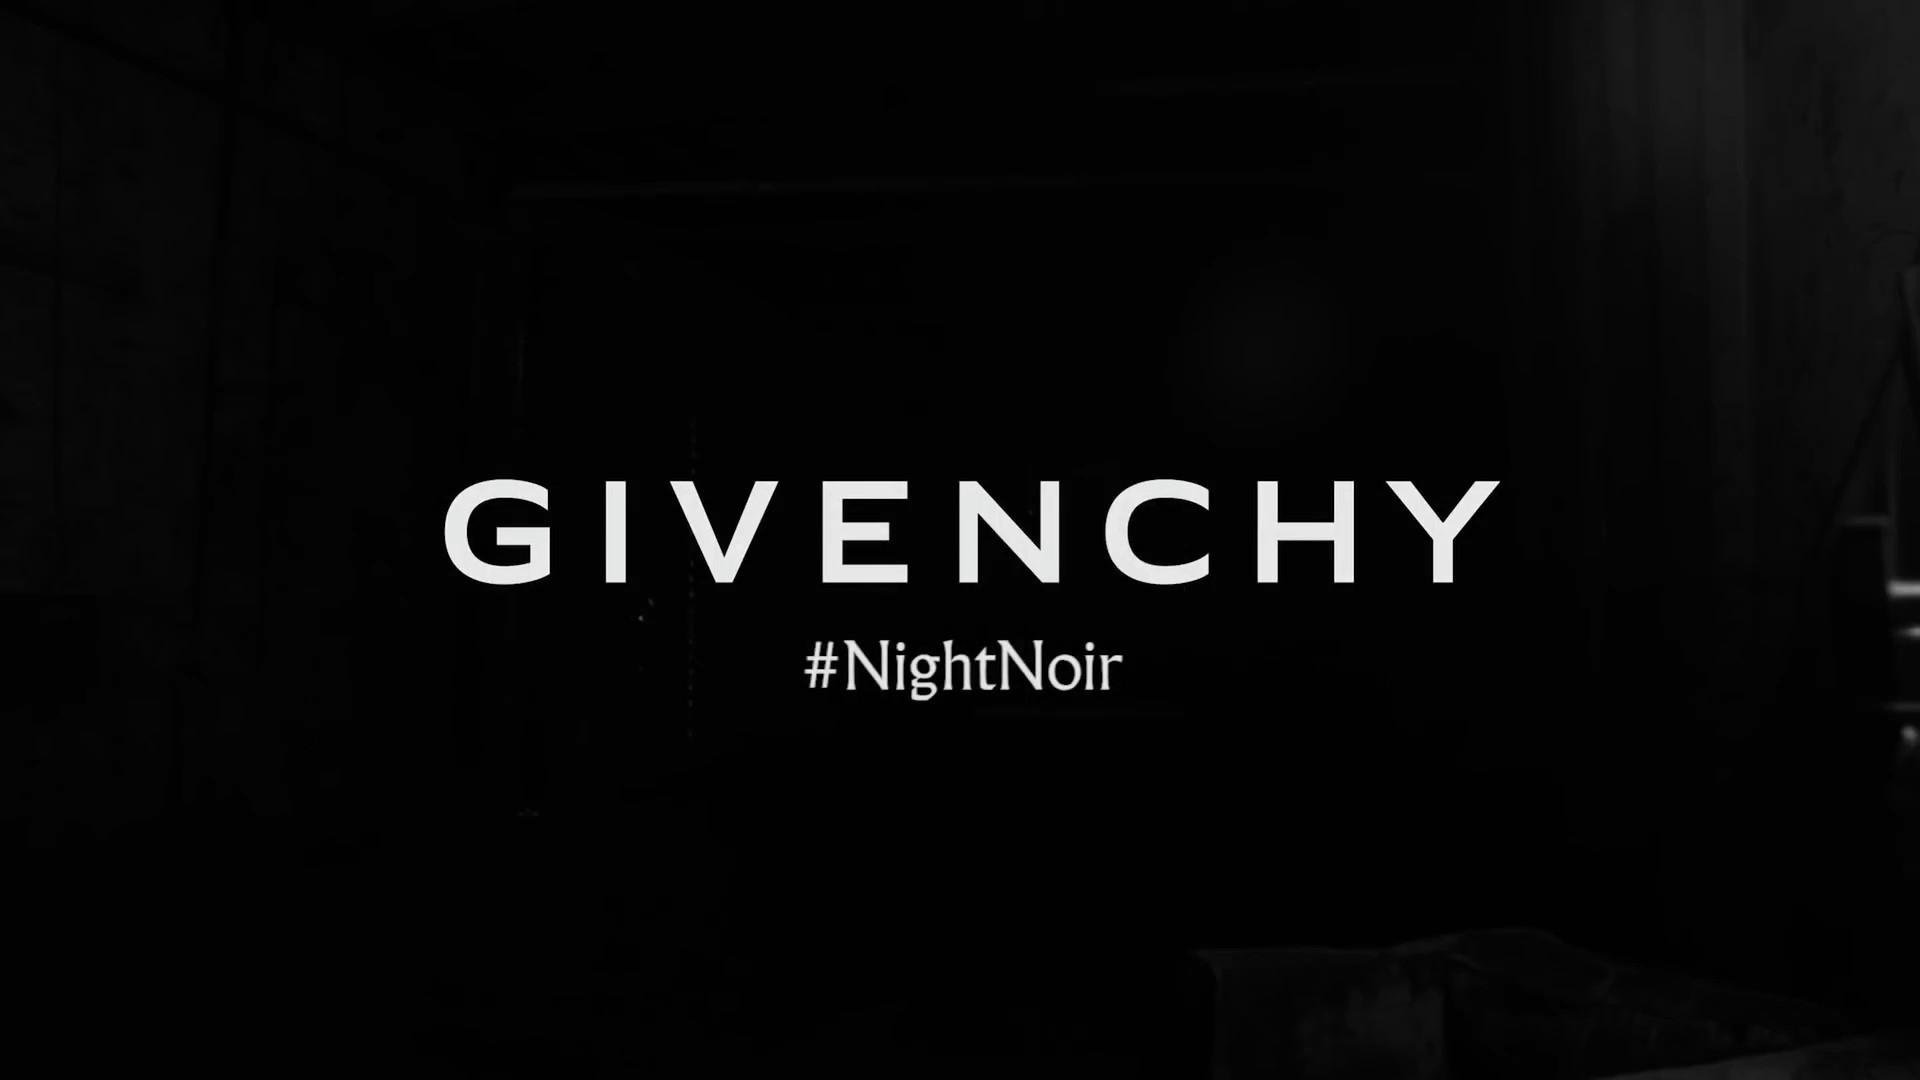 Givenchy - Night Noir